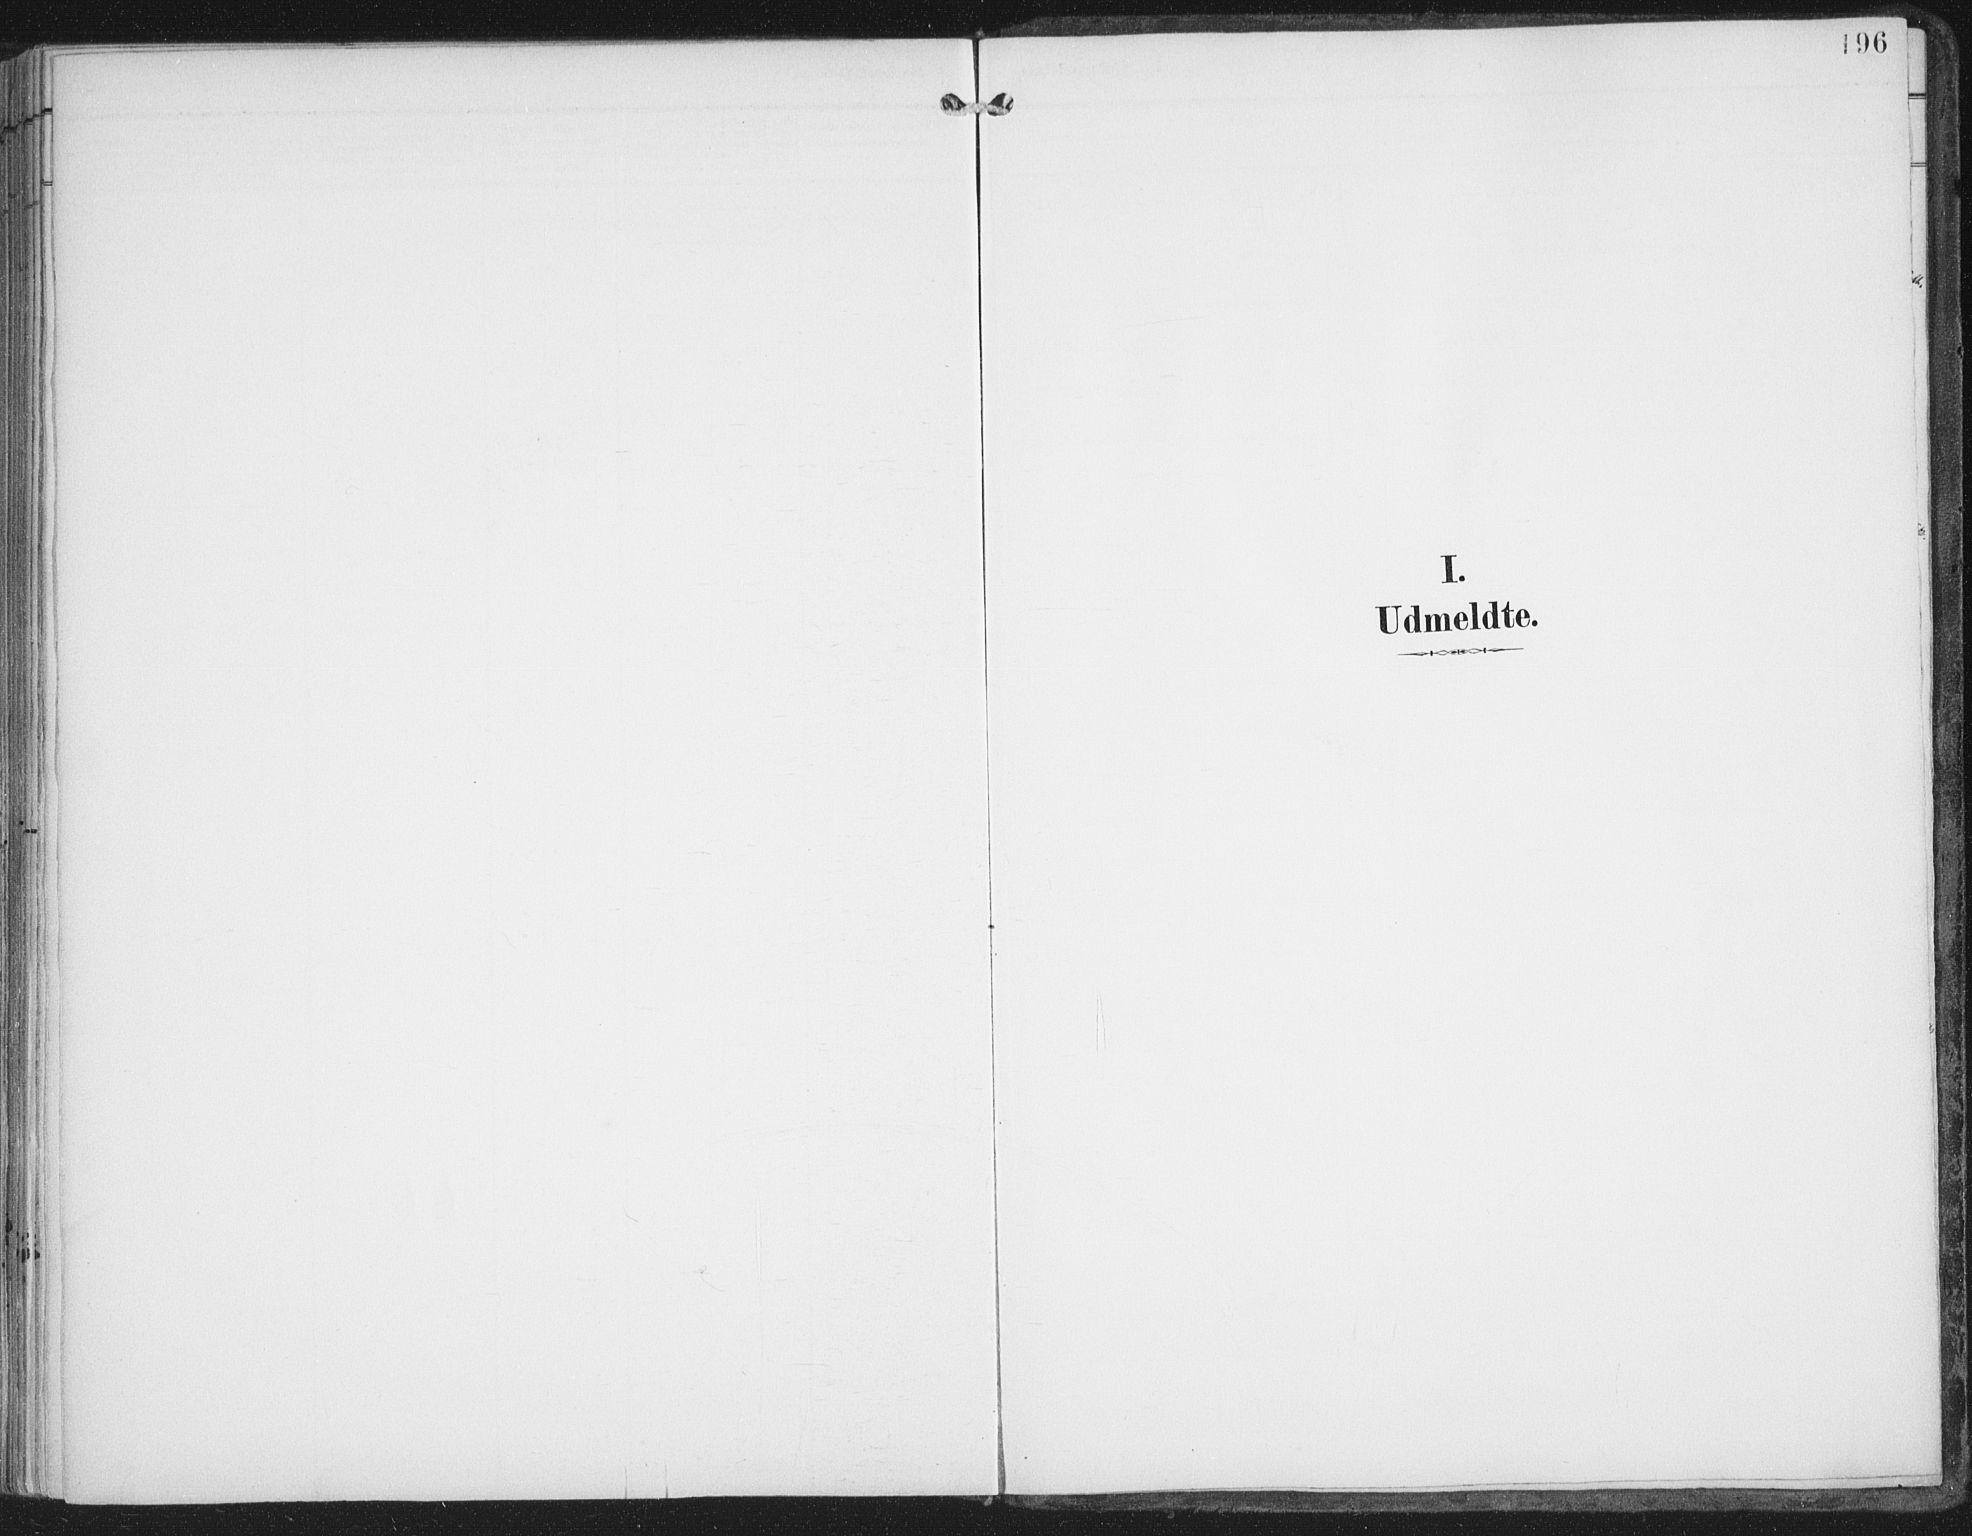 SATØ, Lenvik sokneprestembete, H/Ha: Ministerialbok nr. 15, 1896-1915, s. 196